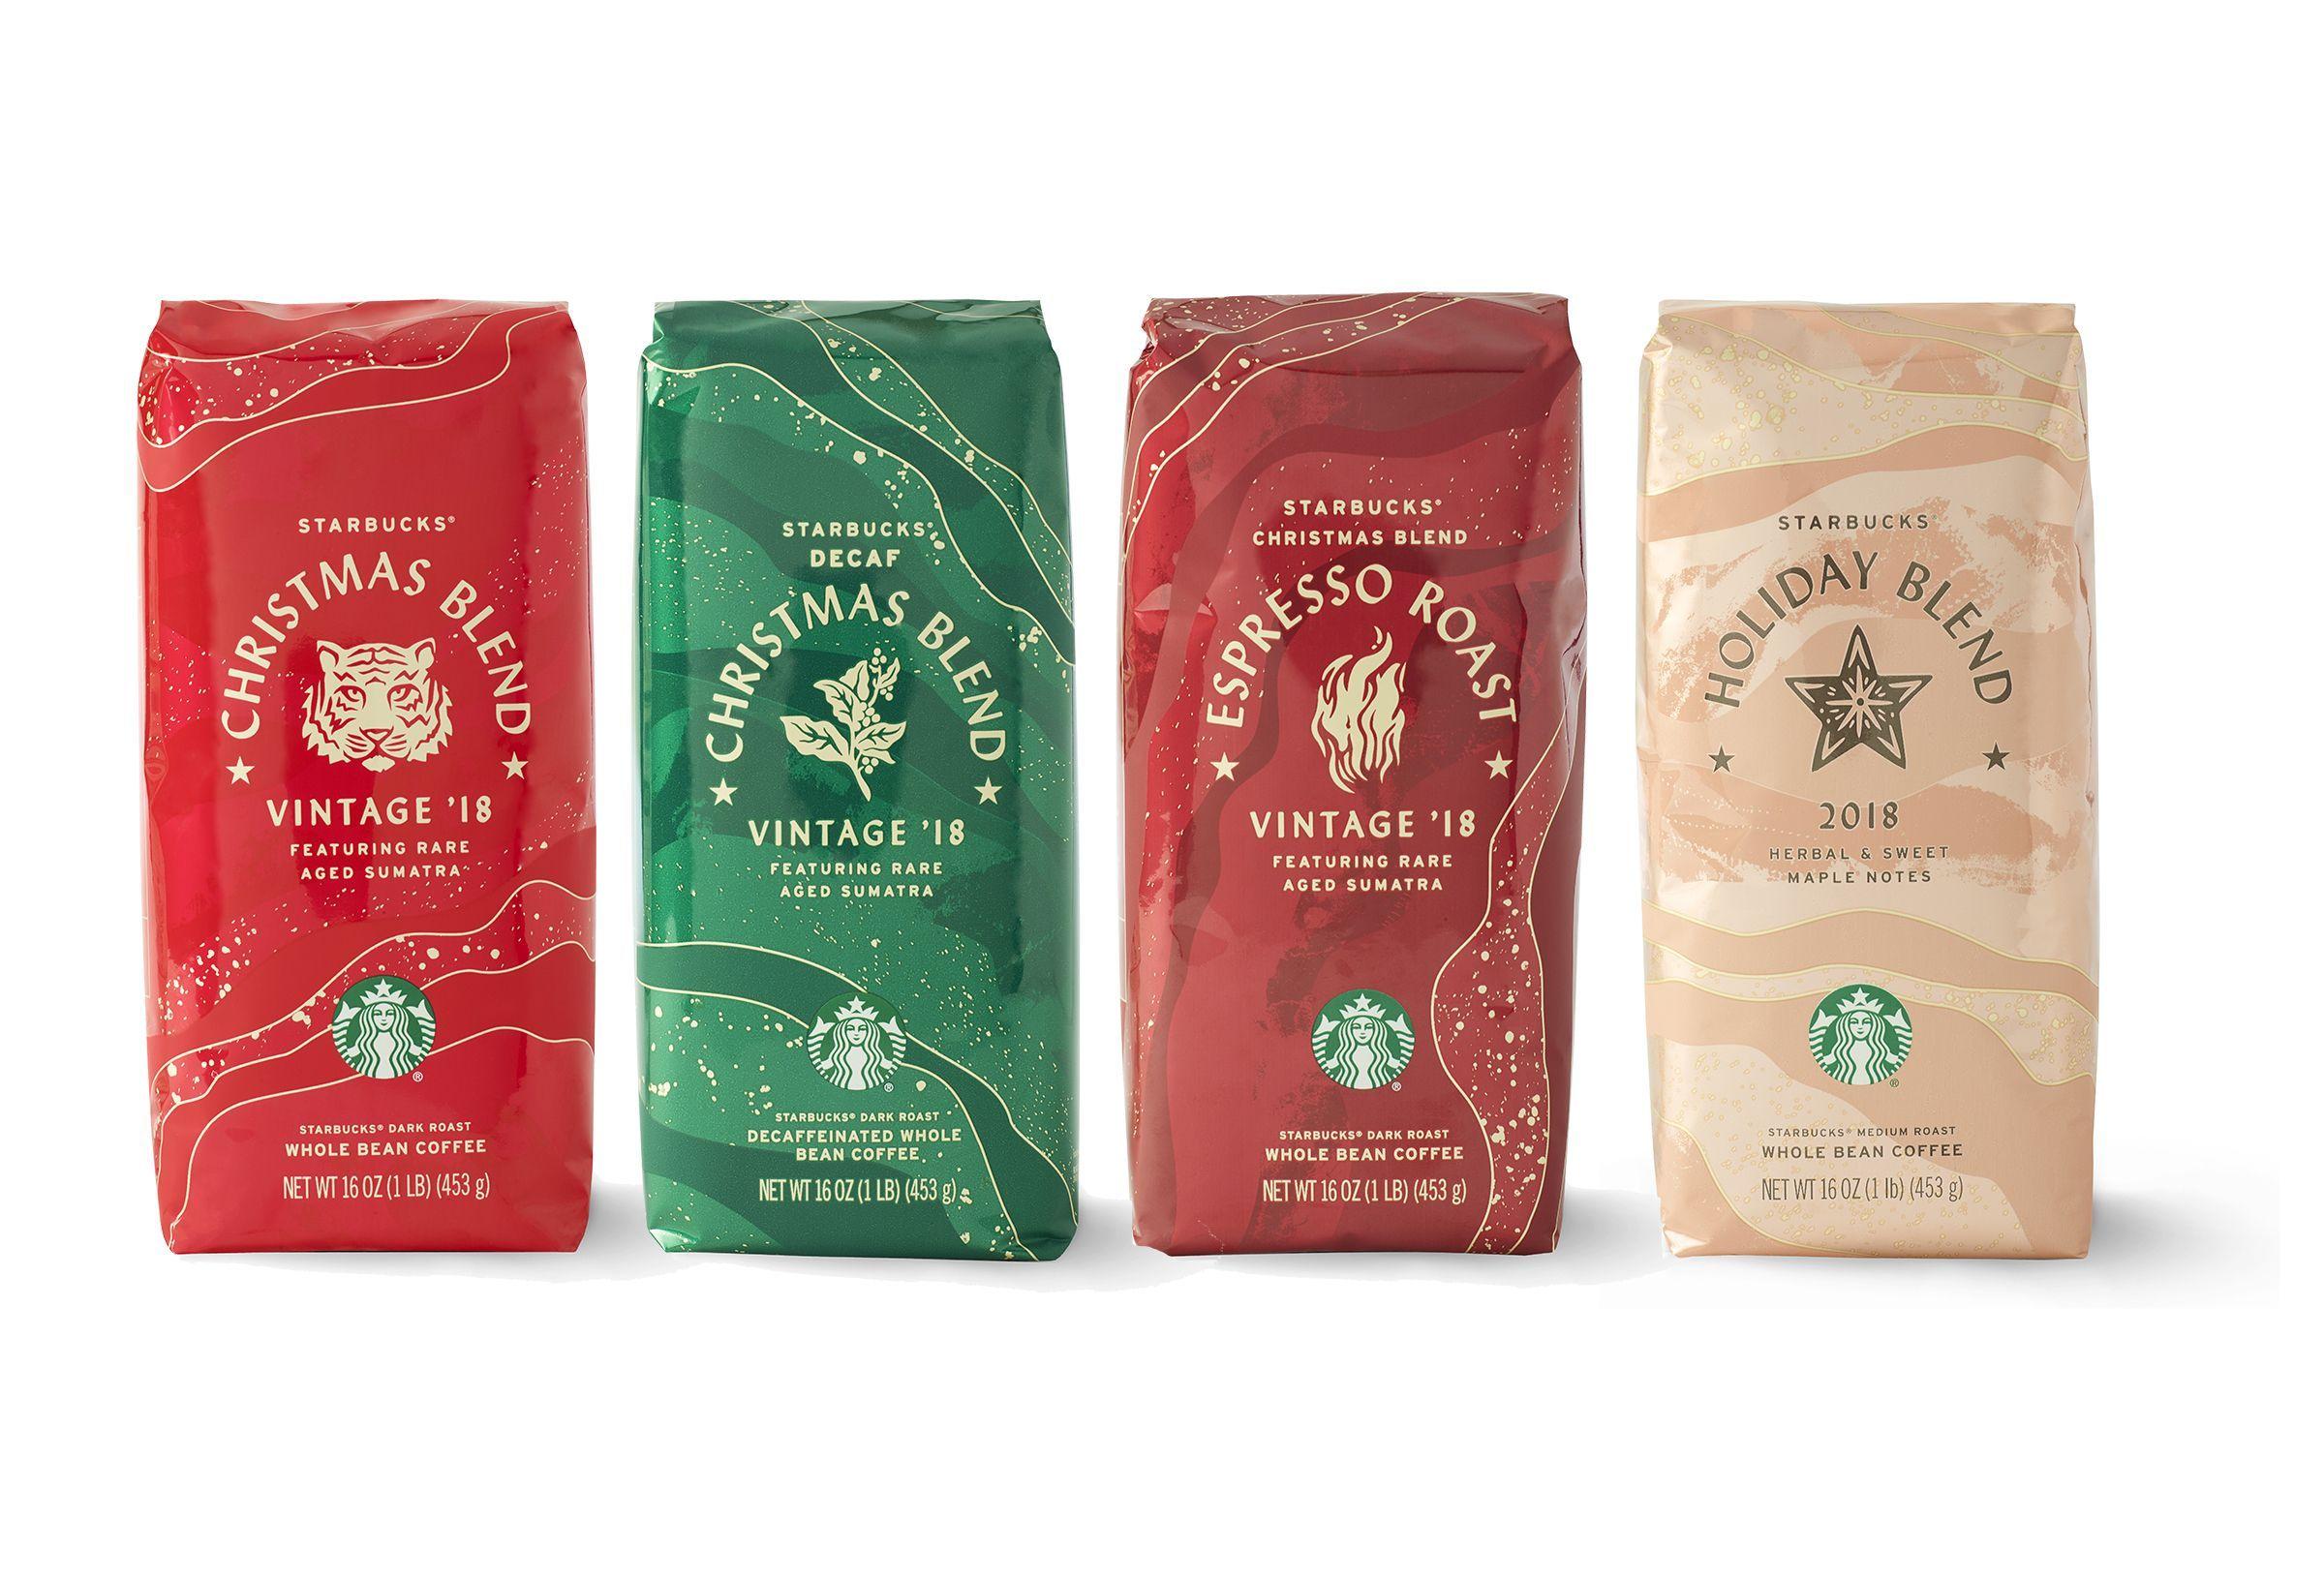 starbuck packaging design Google Search Starbucks